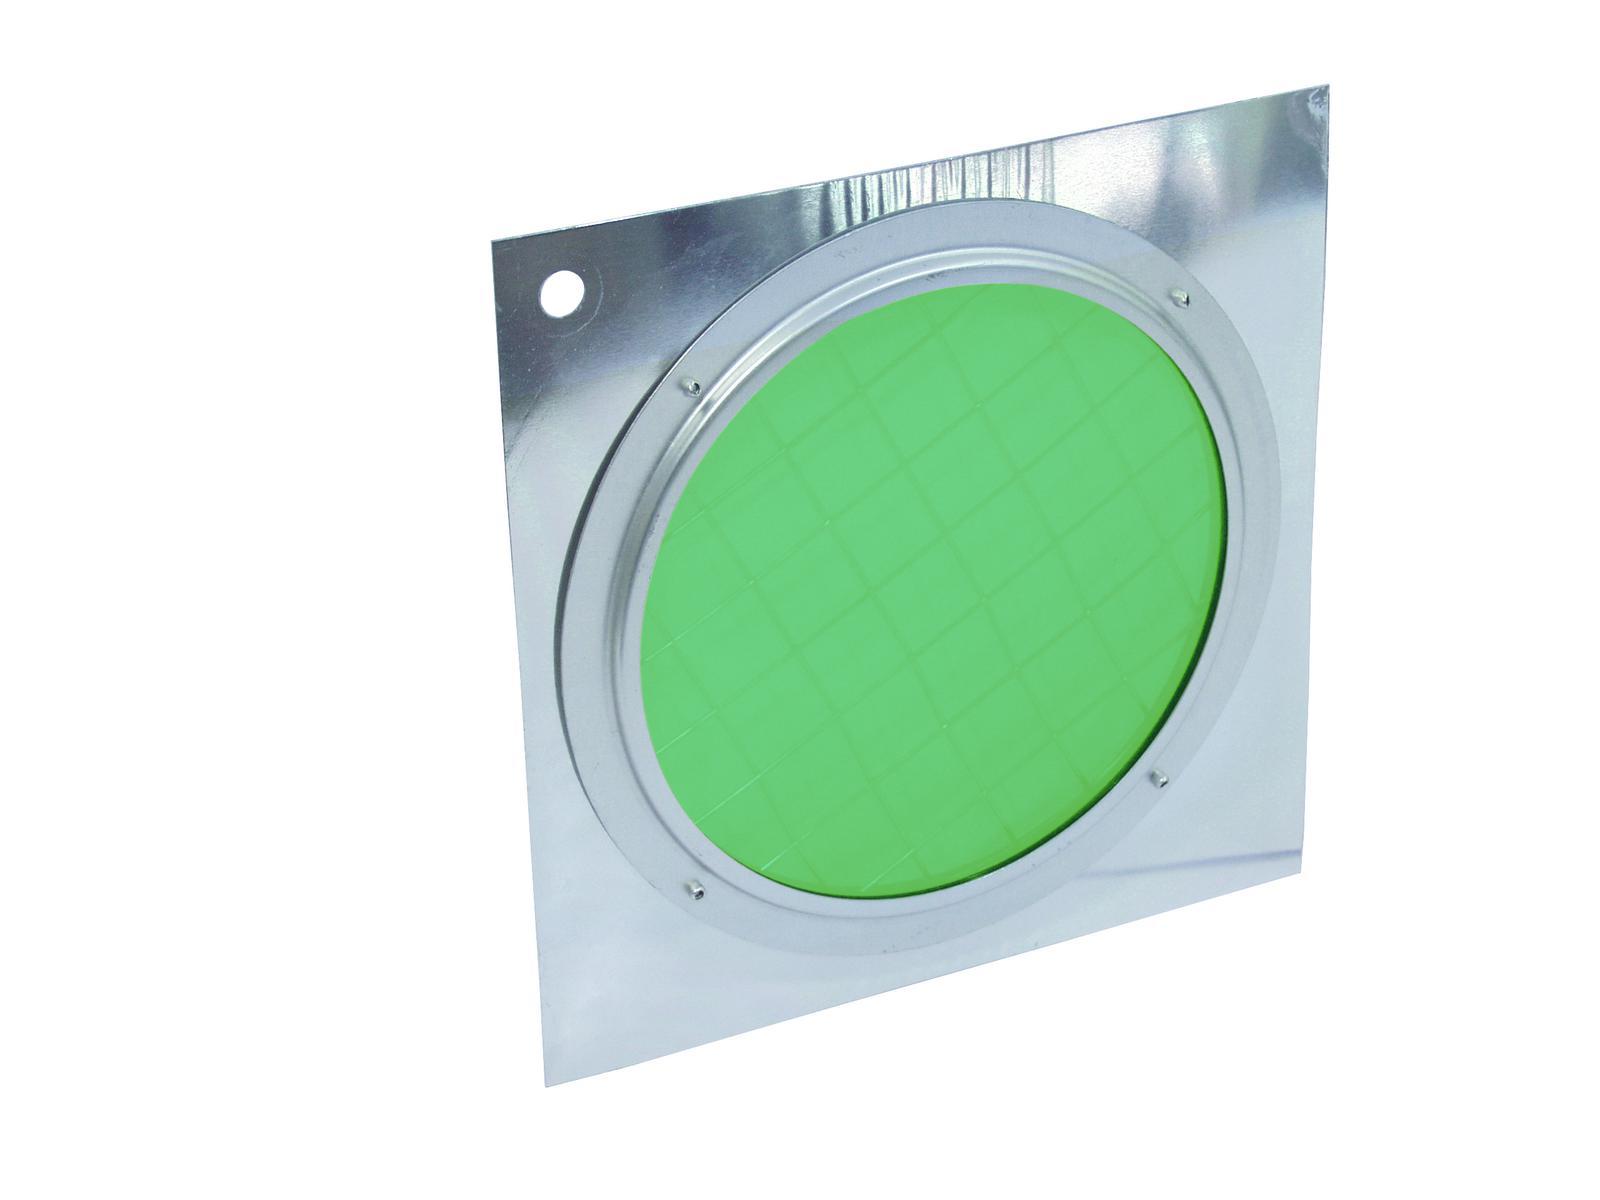 Filtro Frontale dicroico Per Faro Luce Par-56 verde con cornice argento Eurolite